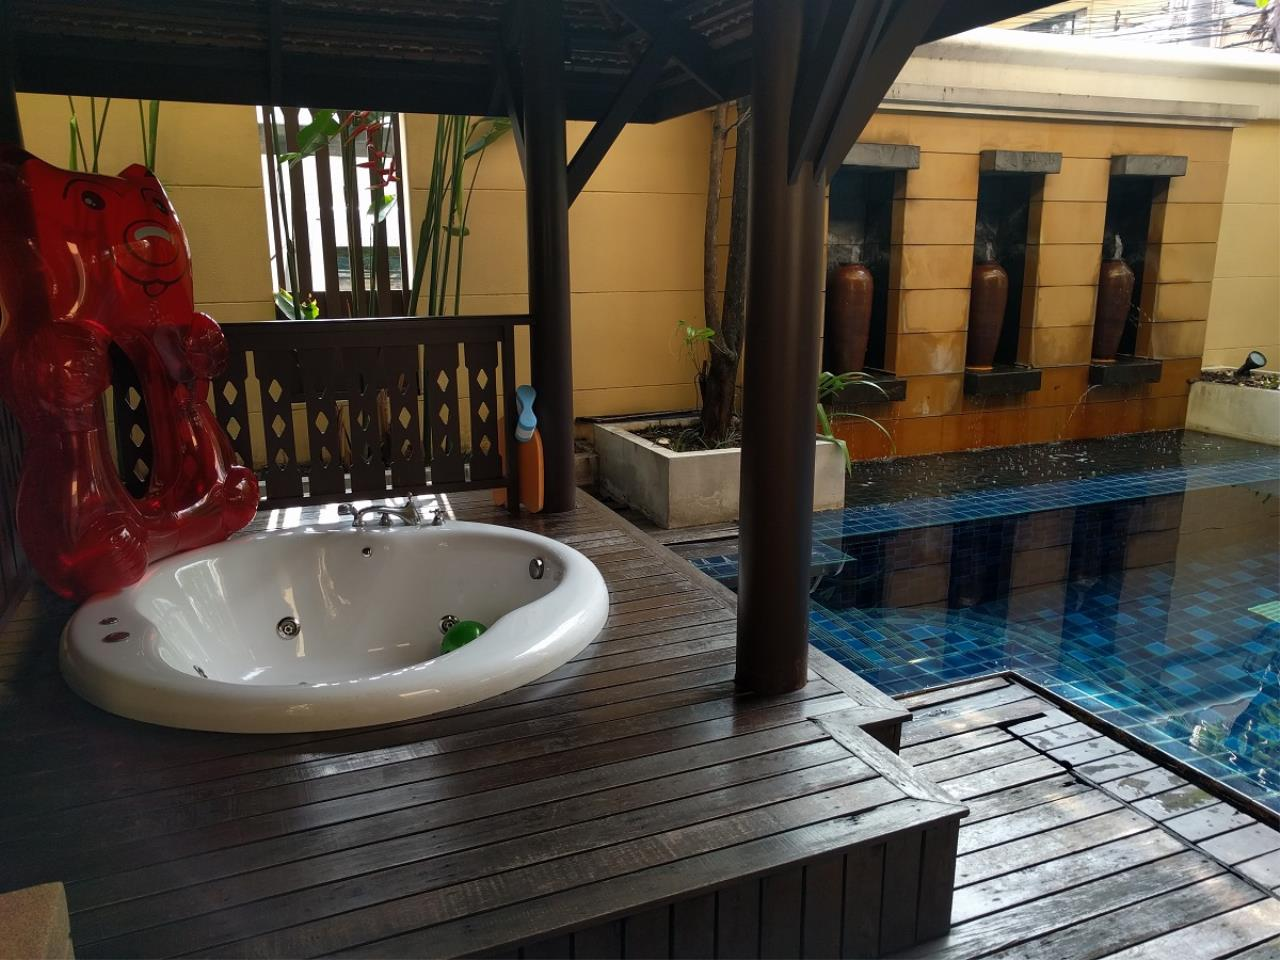 RE/MAX CondoDee Agency's Thai Elegance Luxury Condominium - Entire Building for Sale 29